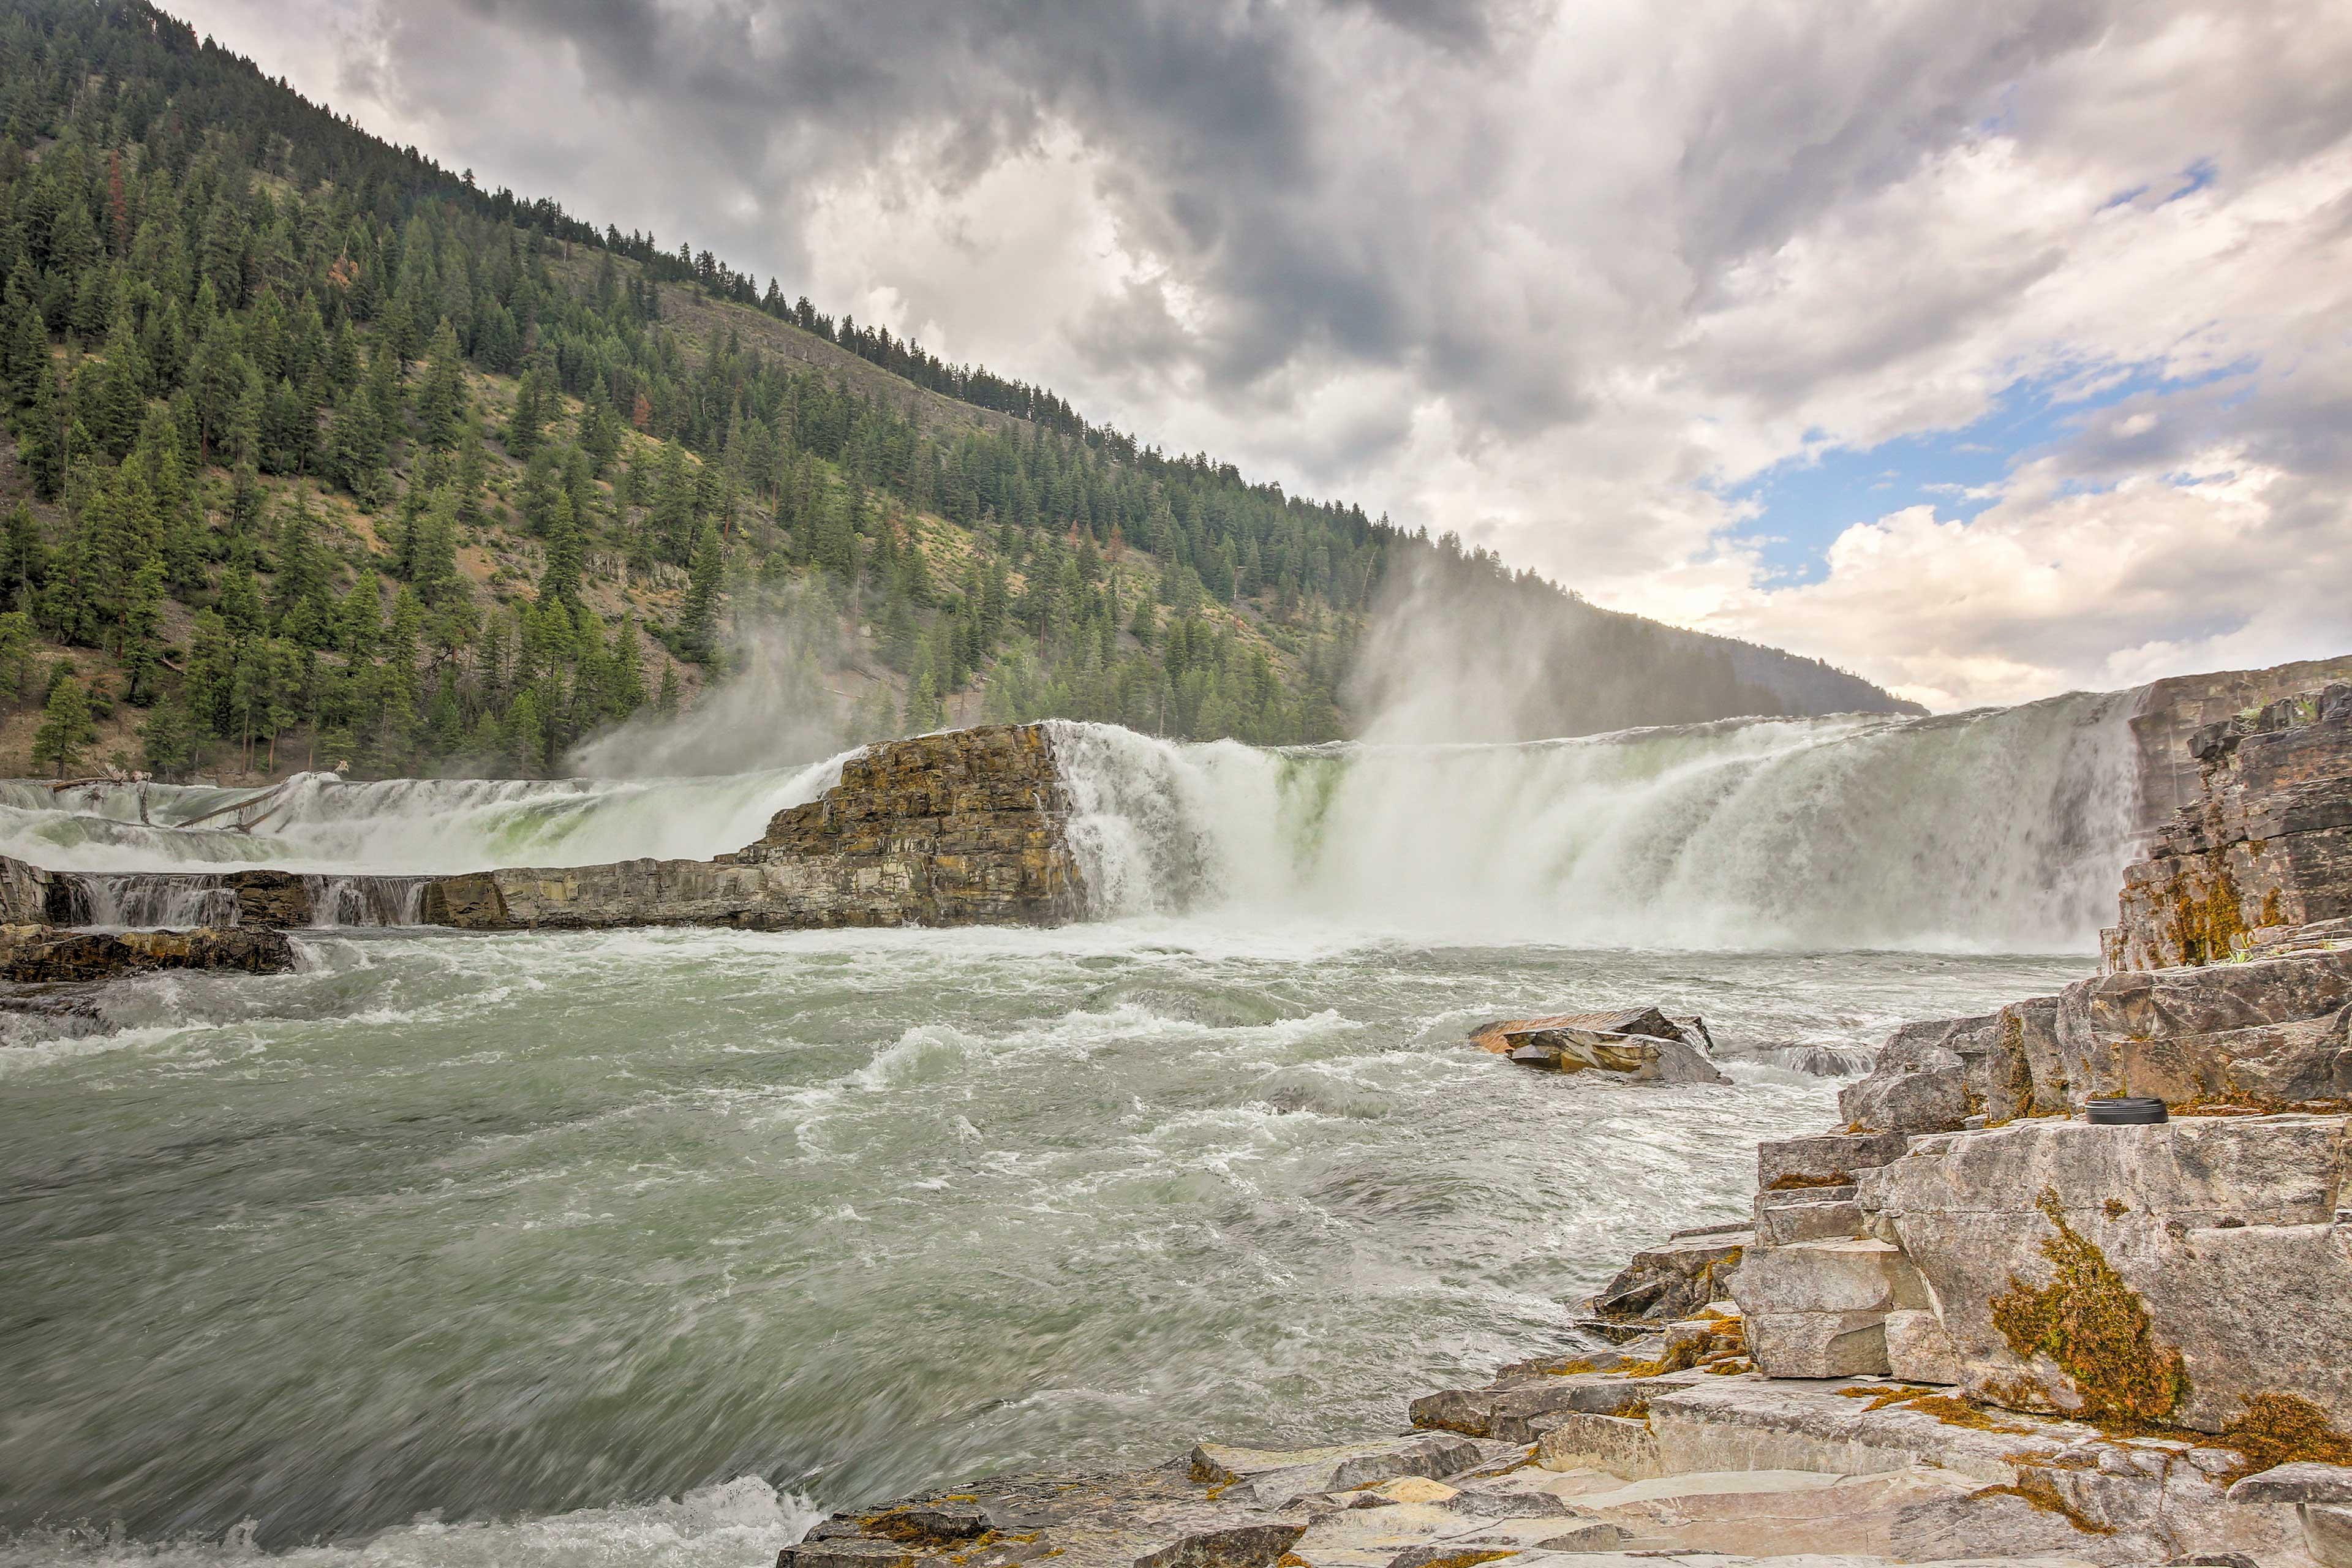 Take scenic hikes to discover majestic waterfalls in the Kootenai area.